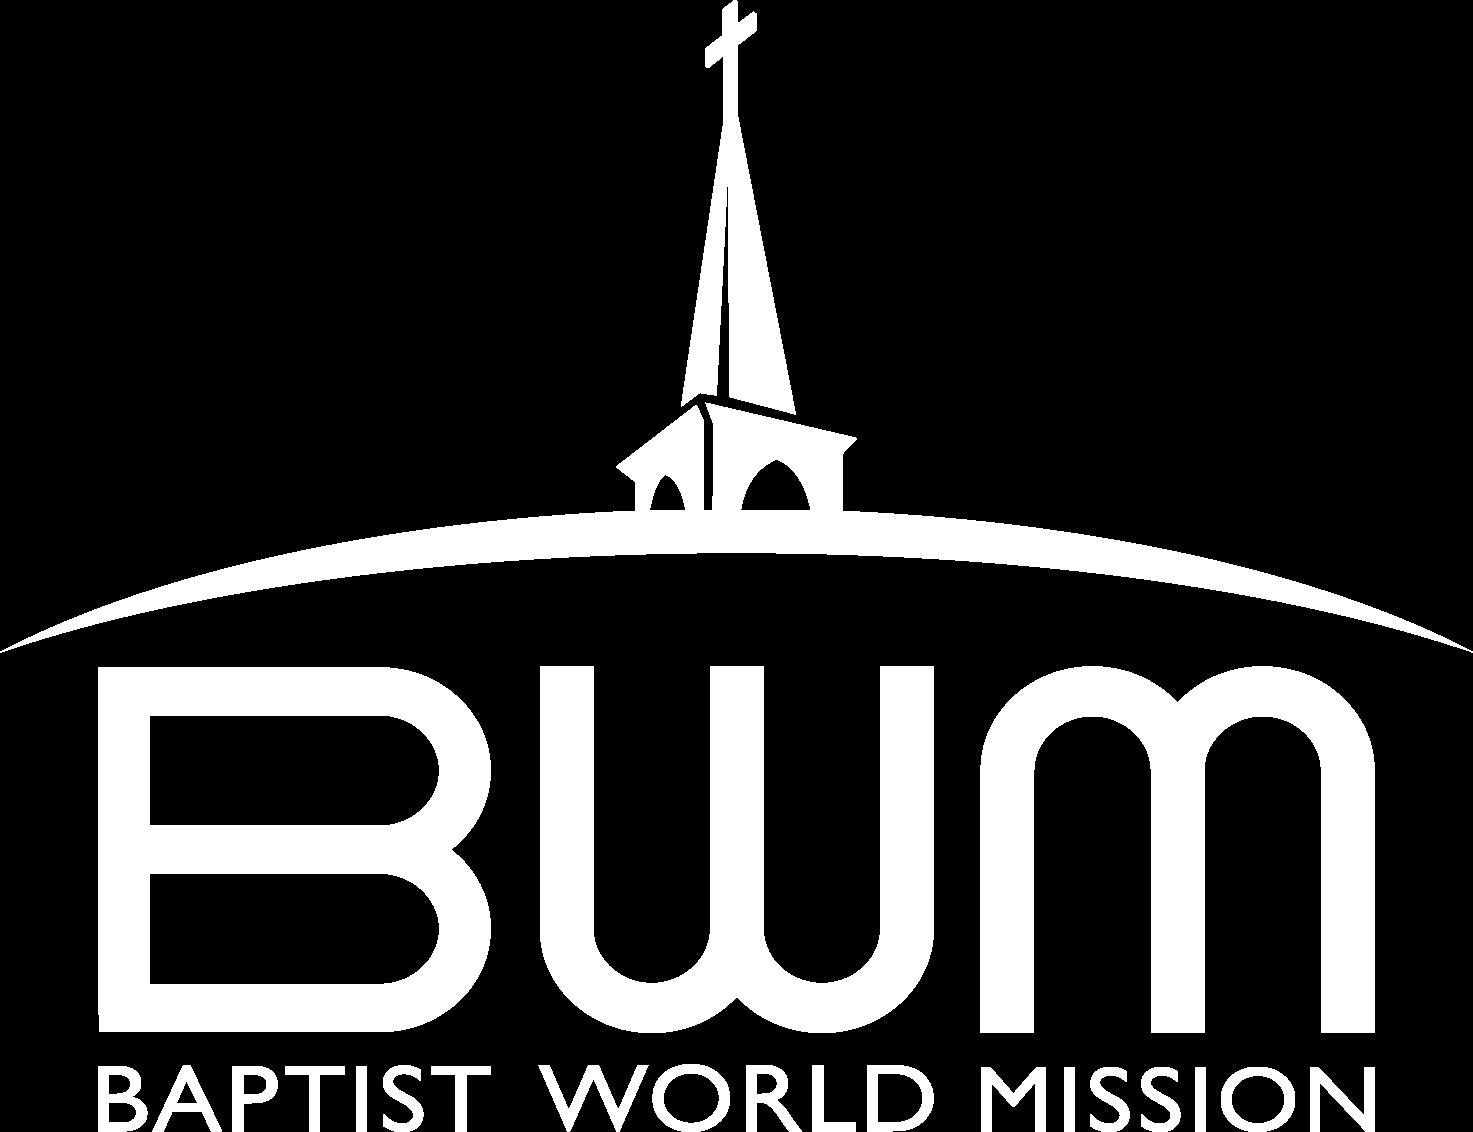 PO Box 2149 Decatur, AL 35602  baptistworldmission.org